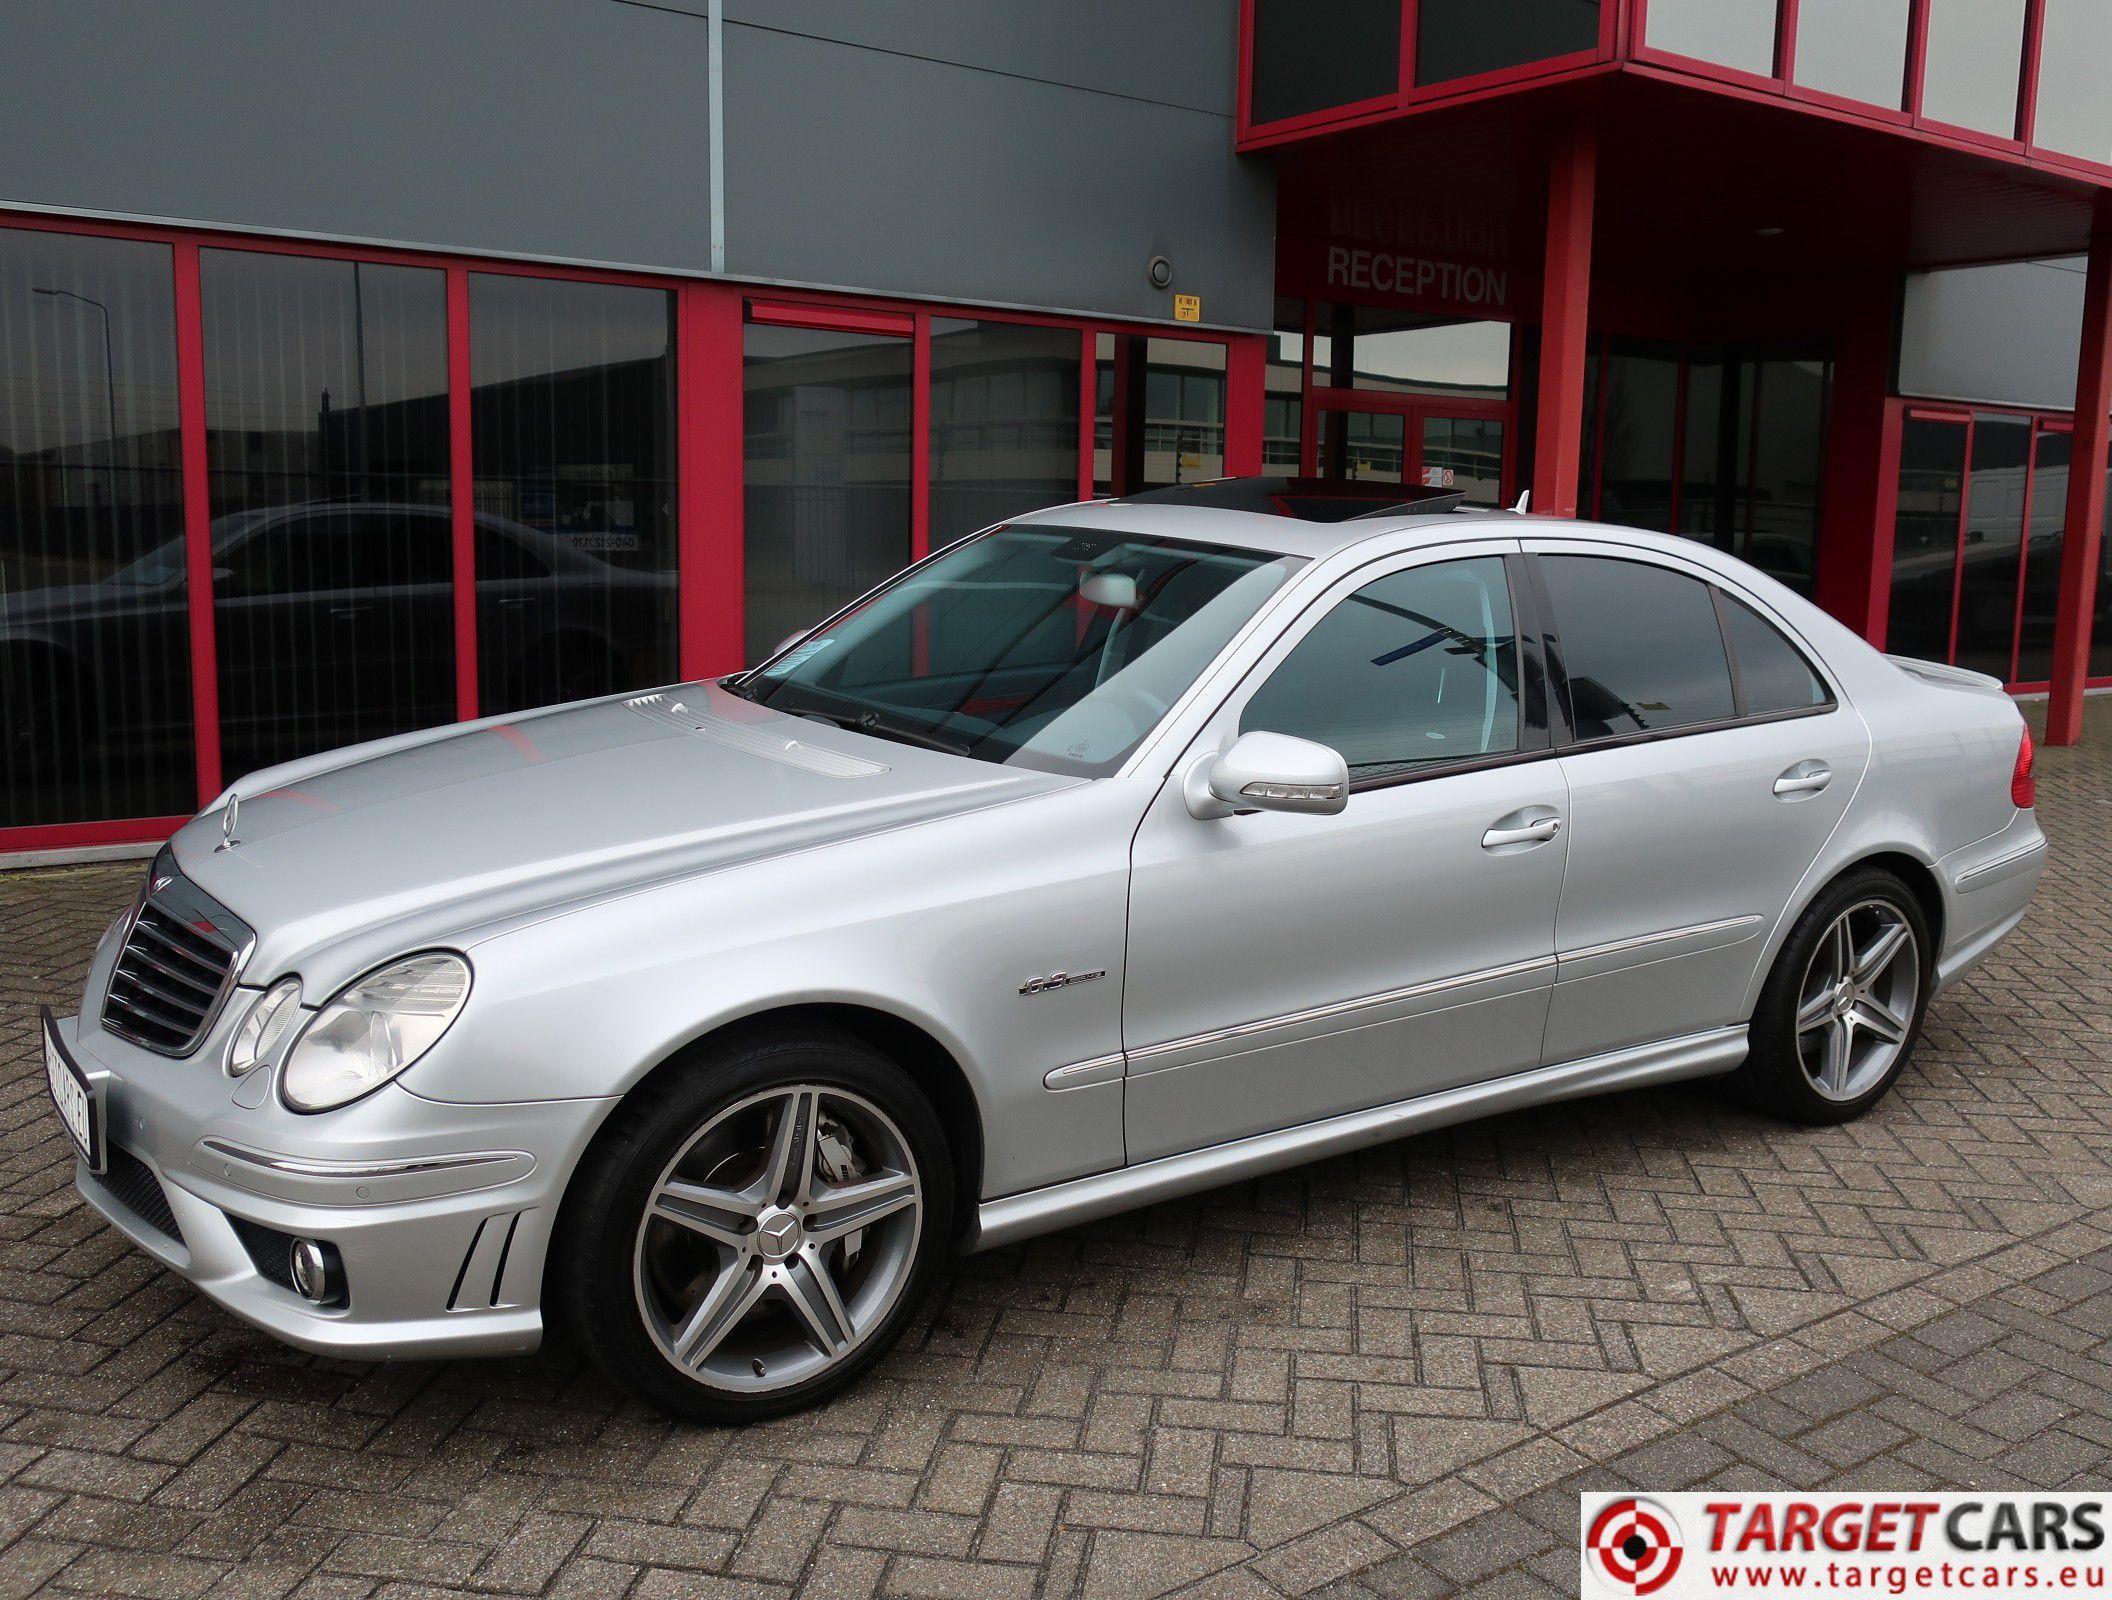 Mercedes E63 Amg >> Mercedes E63 Amg V8 514hp Aut 04 07 Silver 123597km Lhd